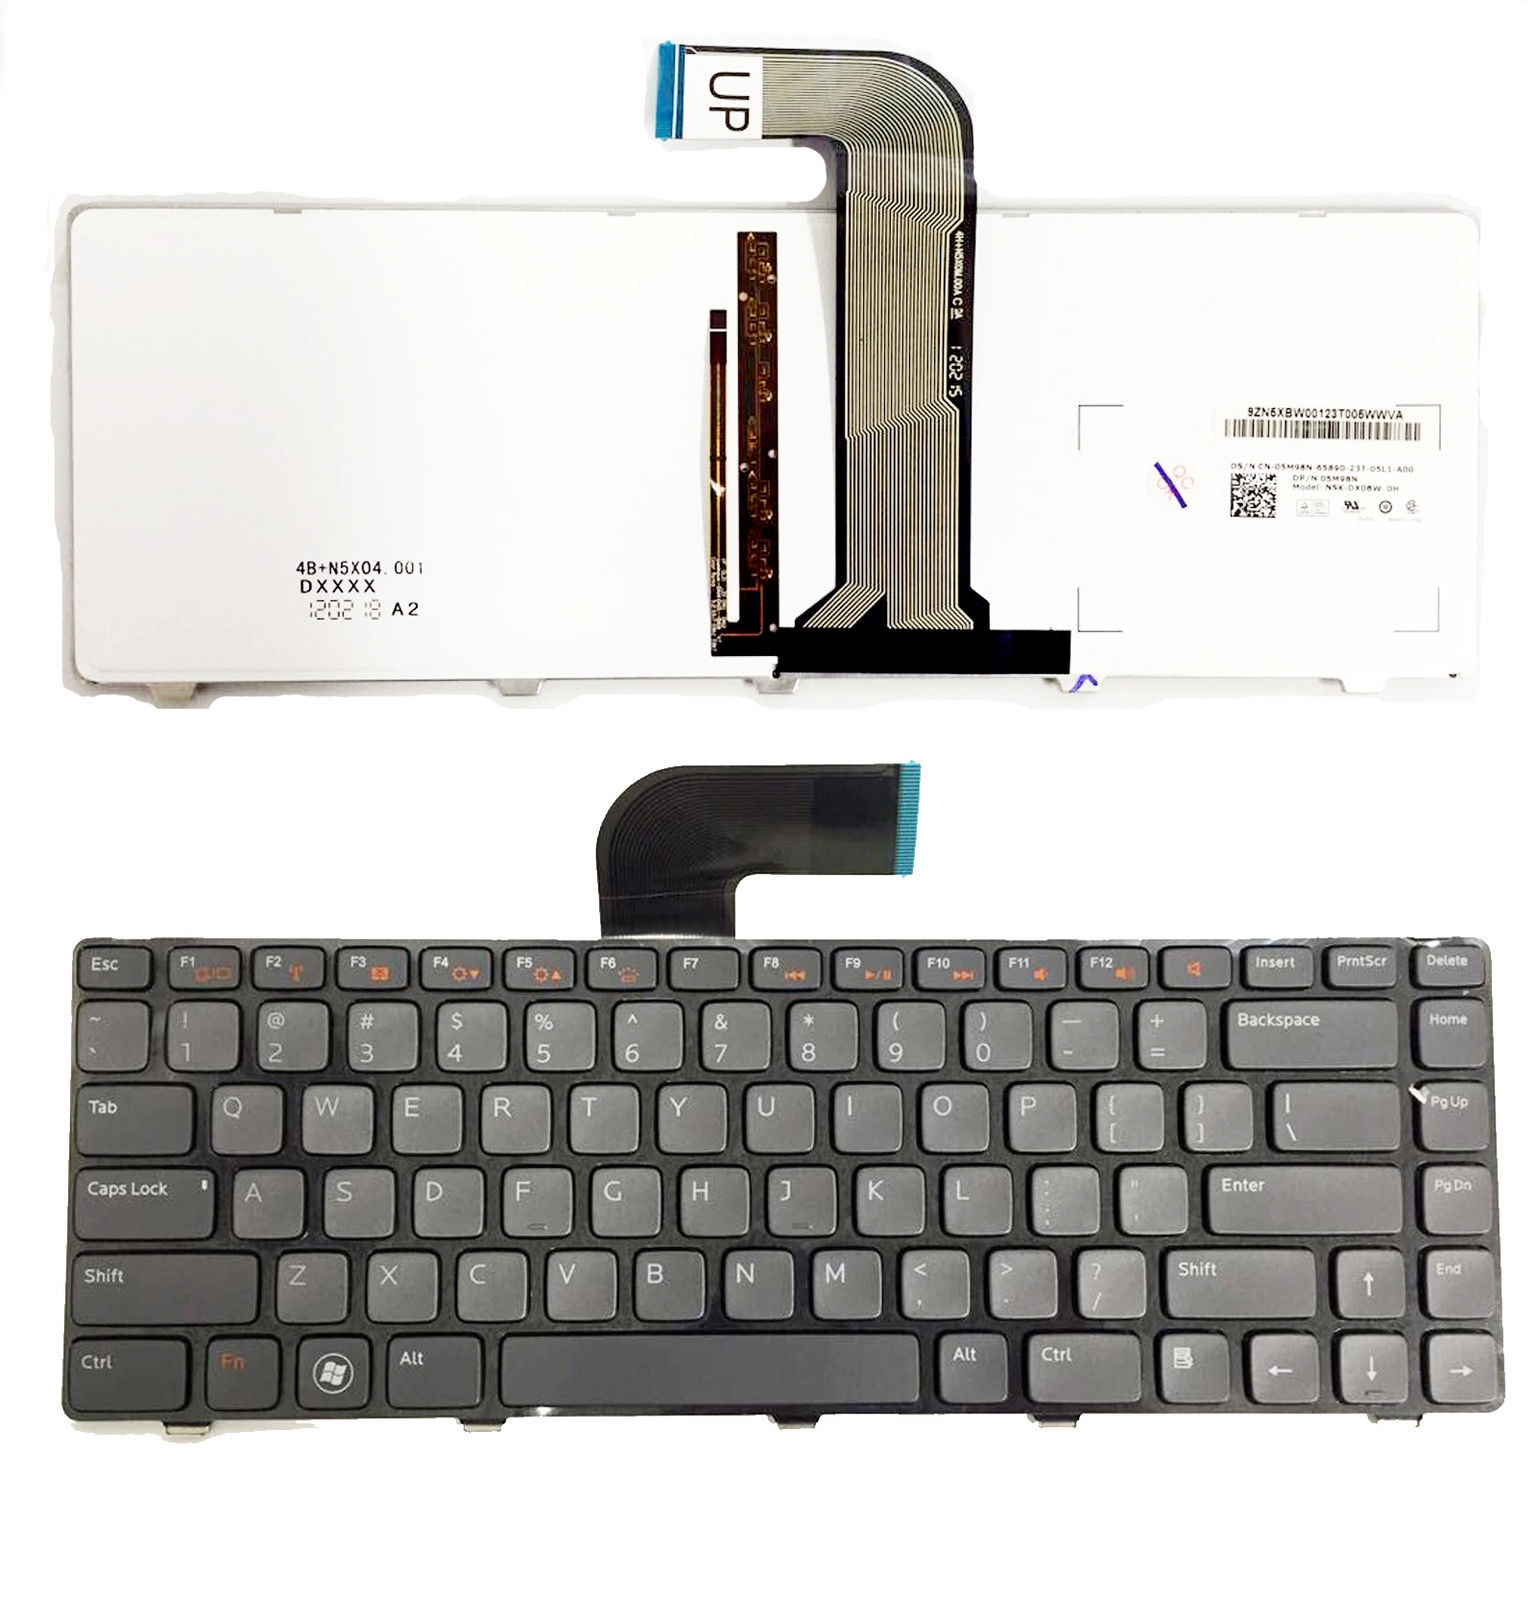 New Genuine for Dell Vostro 1440 1445 3450 3460 3550 3555 3560 BACKLIT Laptop Keyboard dav02amb8f1 laptop motherboard for dell vostro 3450 gg0vm best quality tested ok